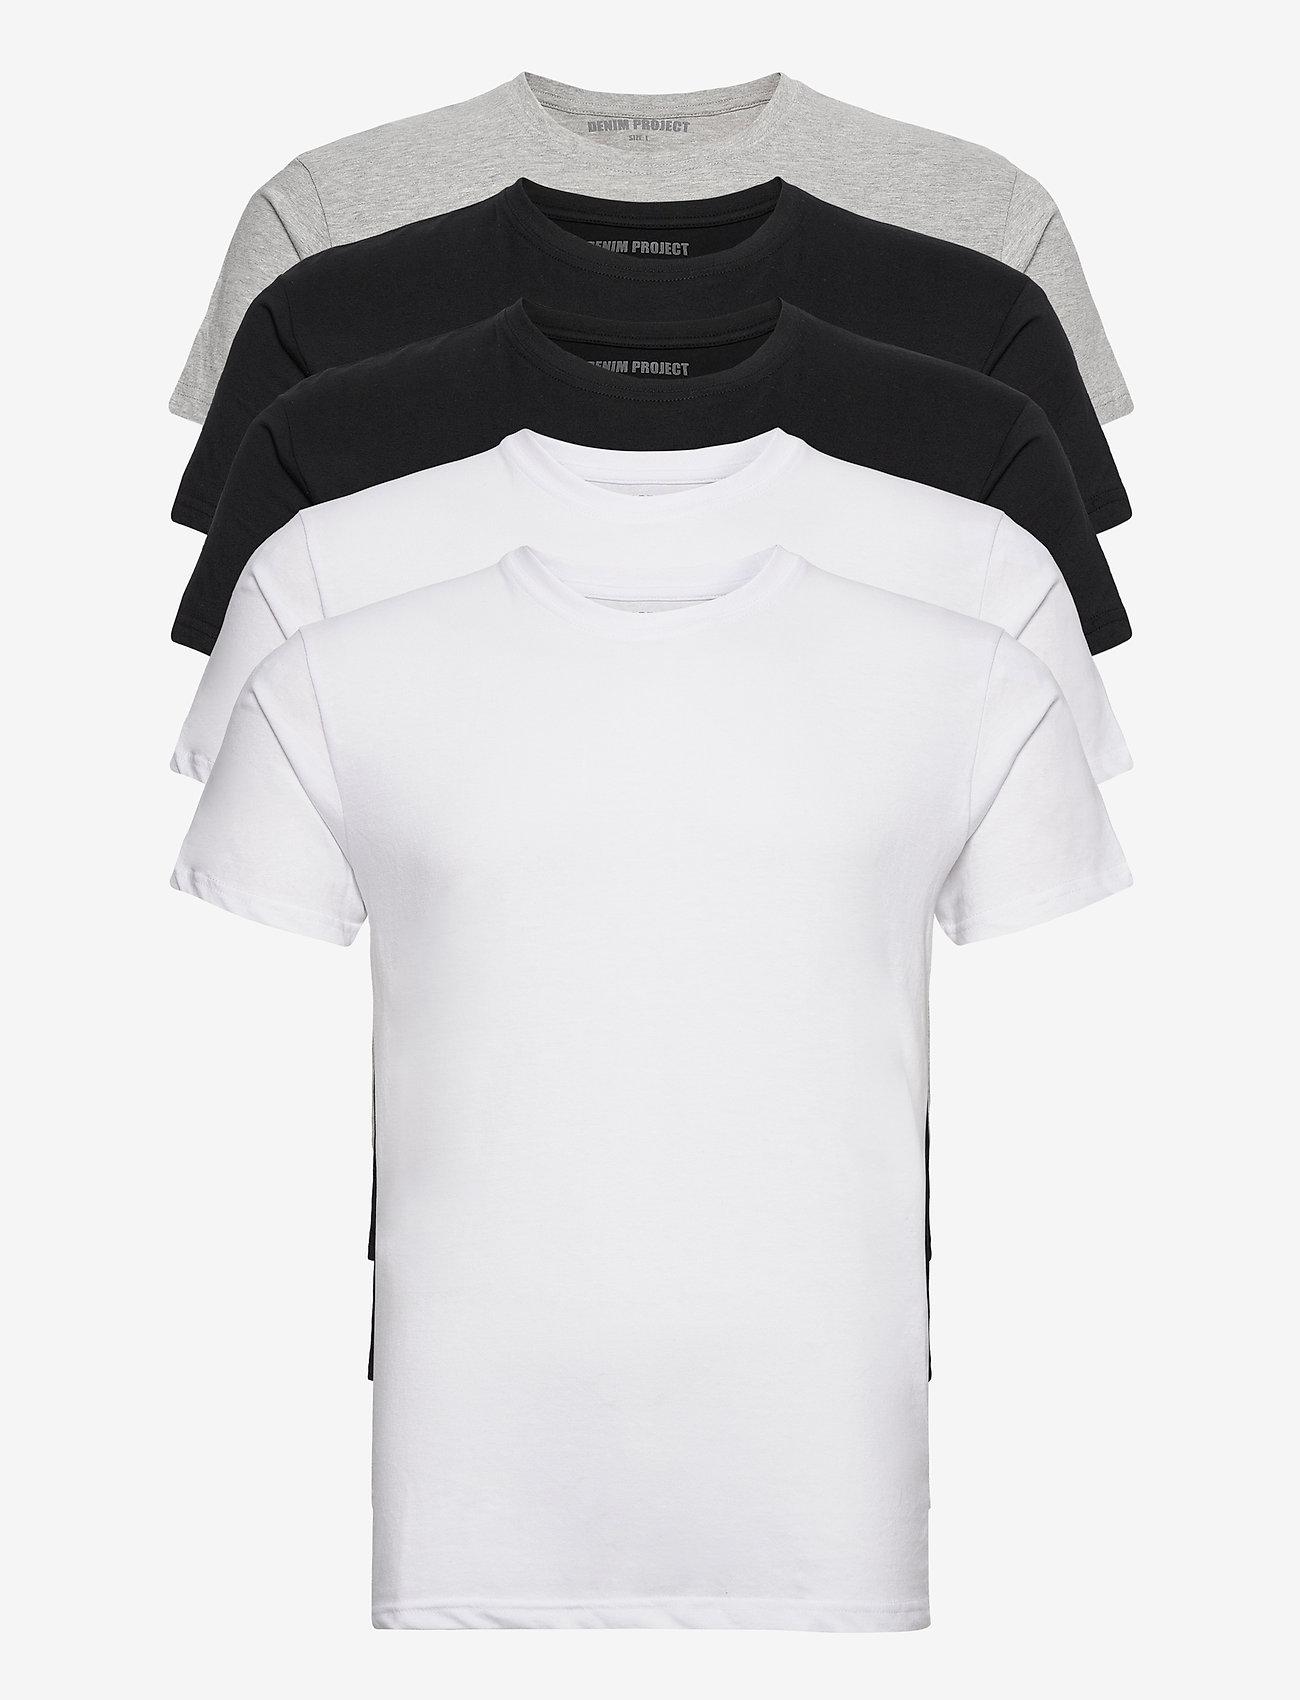 Denim project - 5 PACK T-SHIRTS - basic t-shirts - black/white/light grey melange - 0